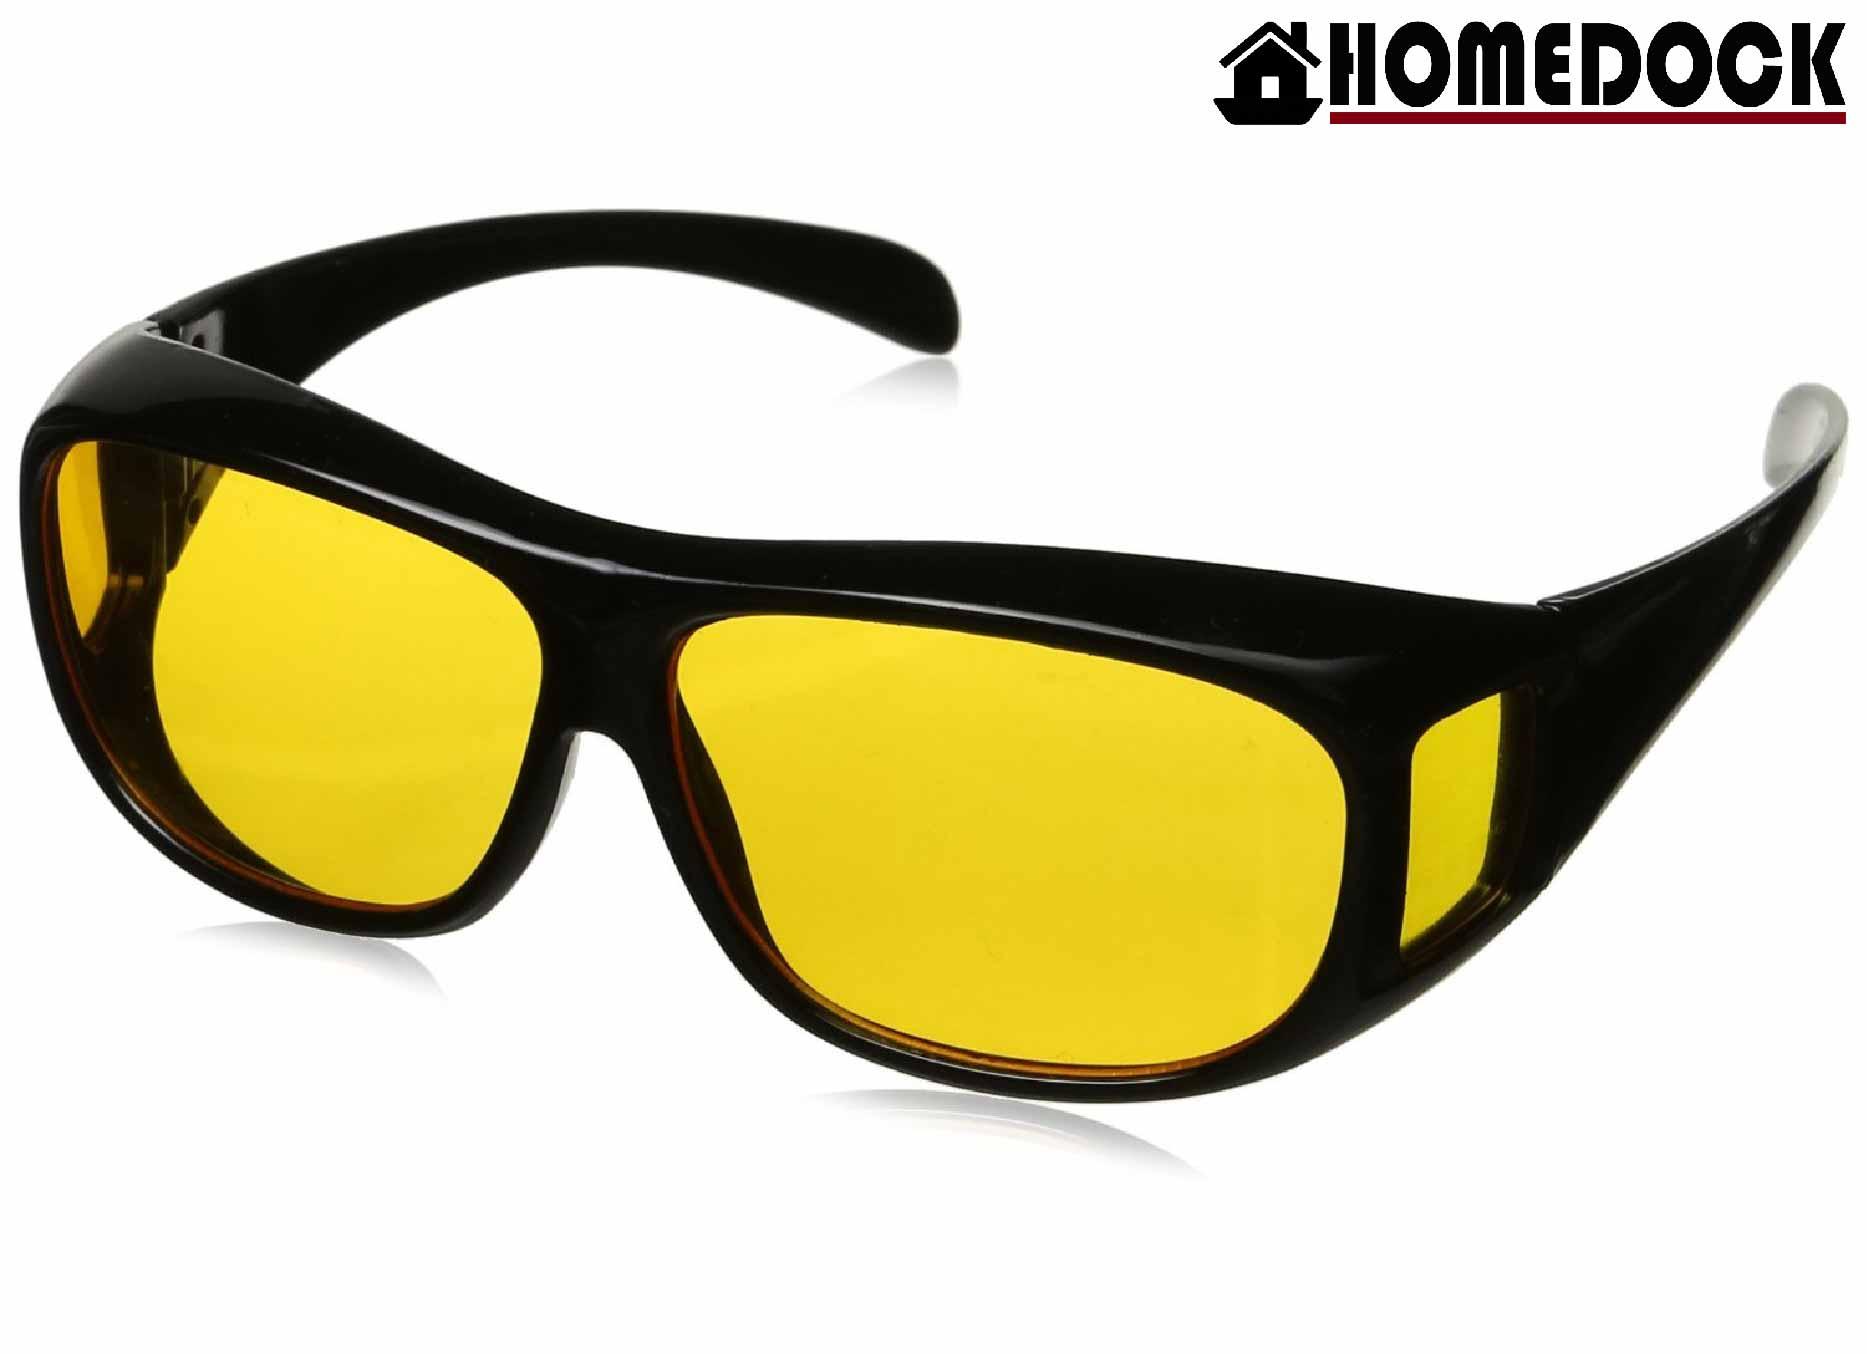 HOMEDOCK-HD防眩光遮陽眼鏡 兩入裝